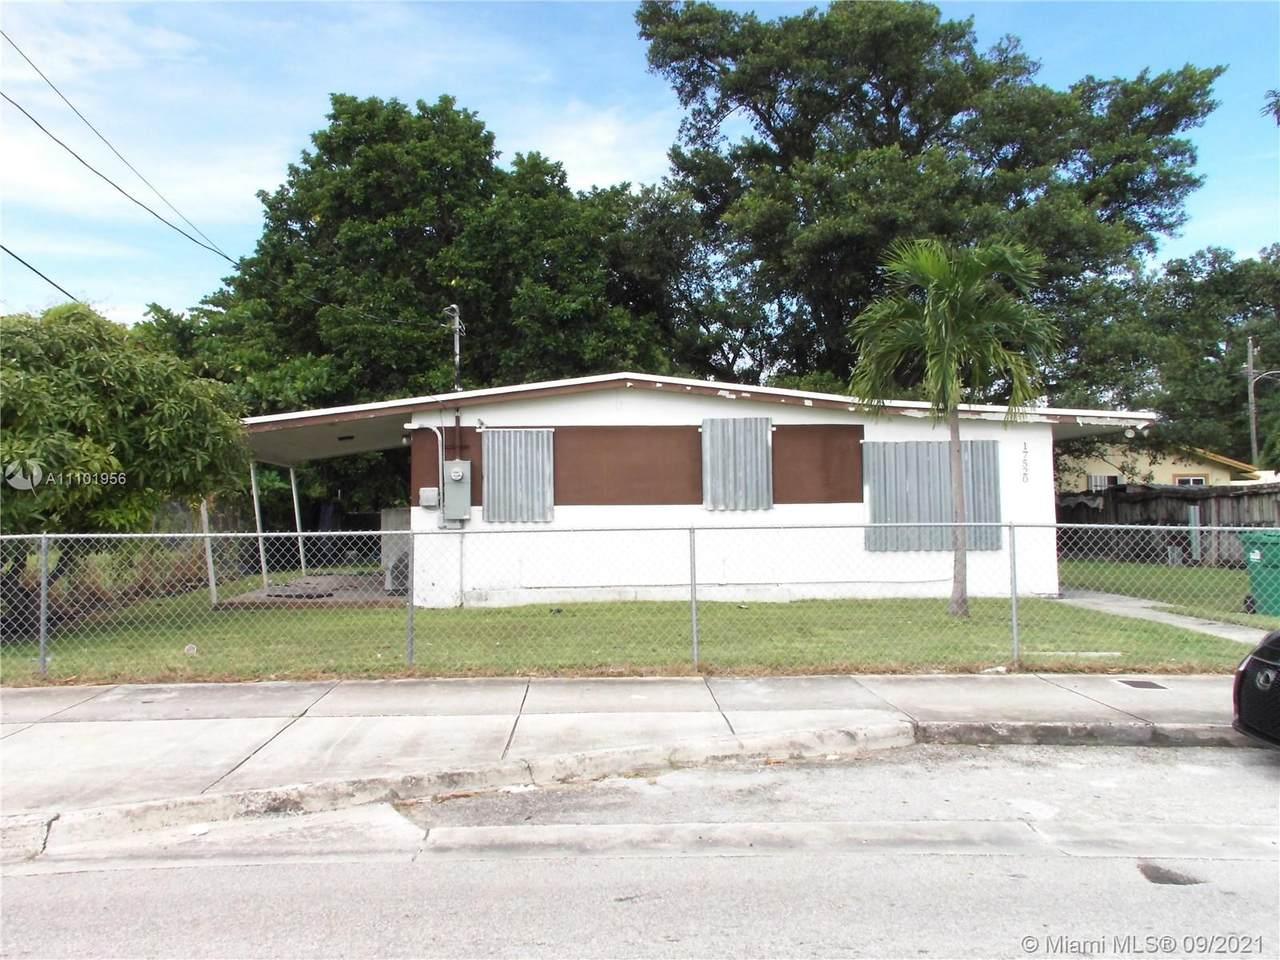 17520 Homestead Ave - Photo 1